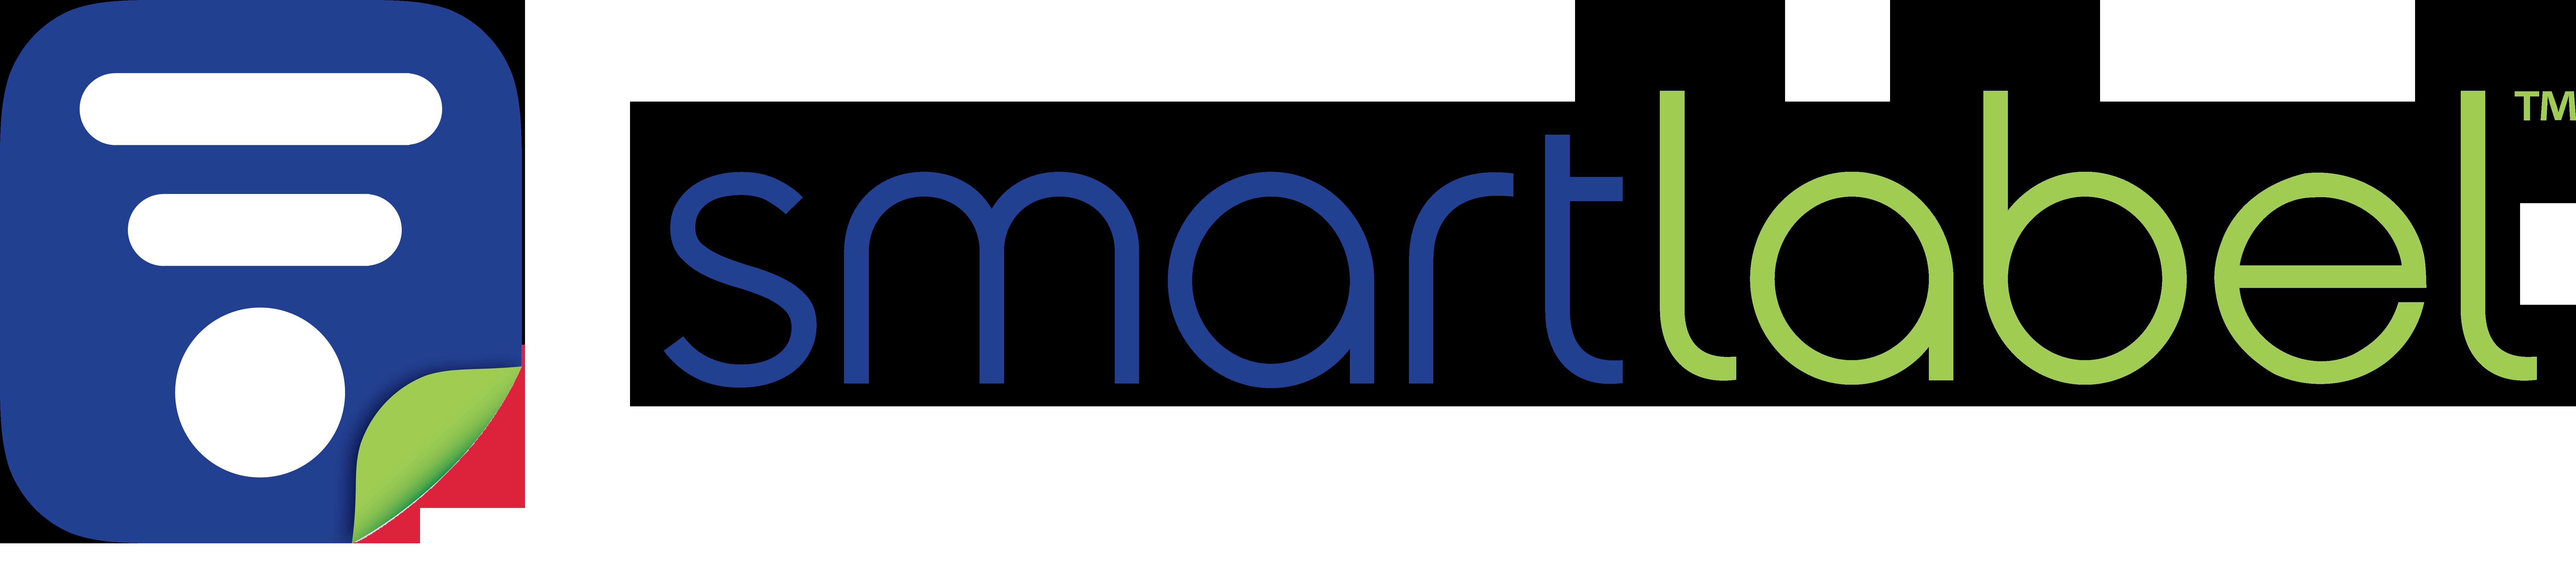 SmartLabel_Refined_Horizontal